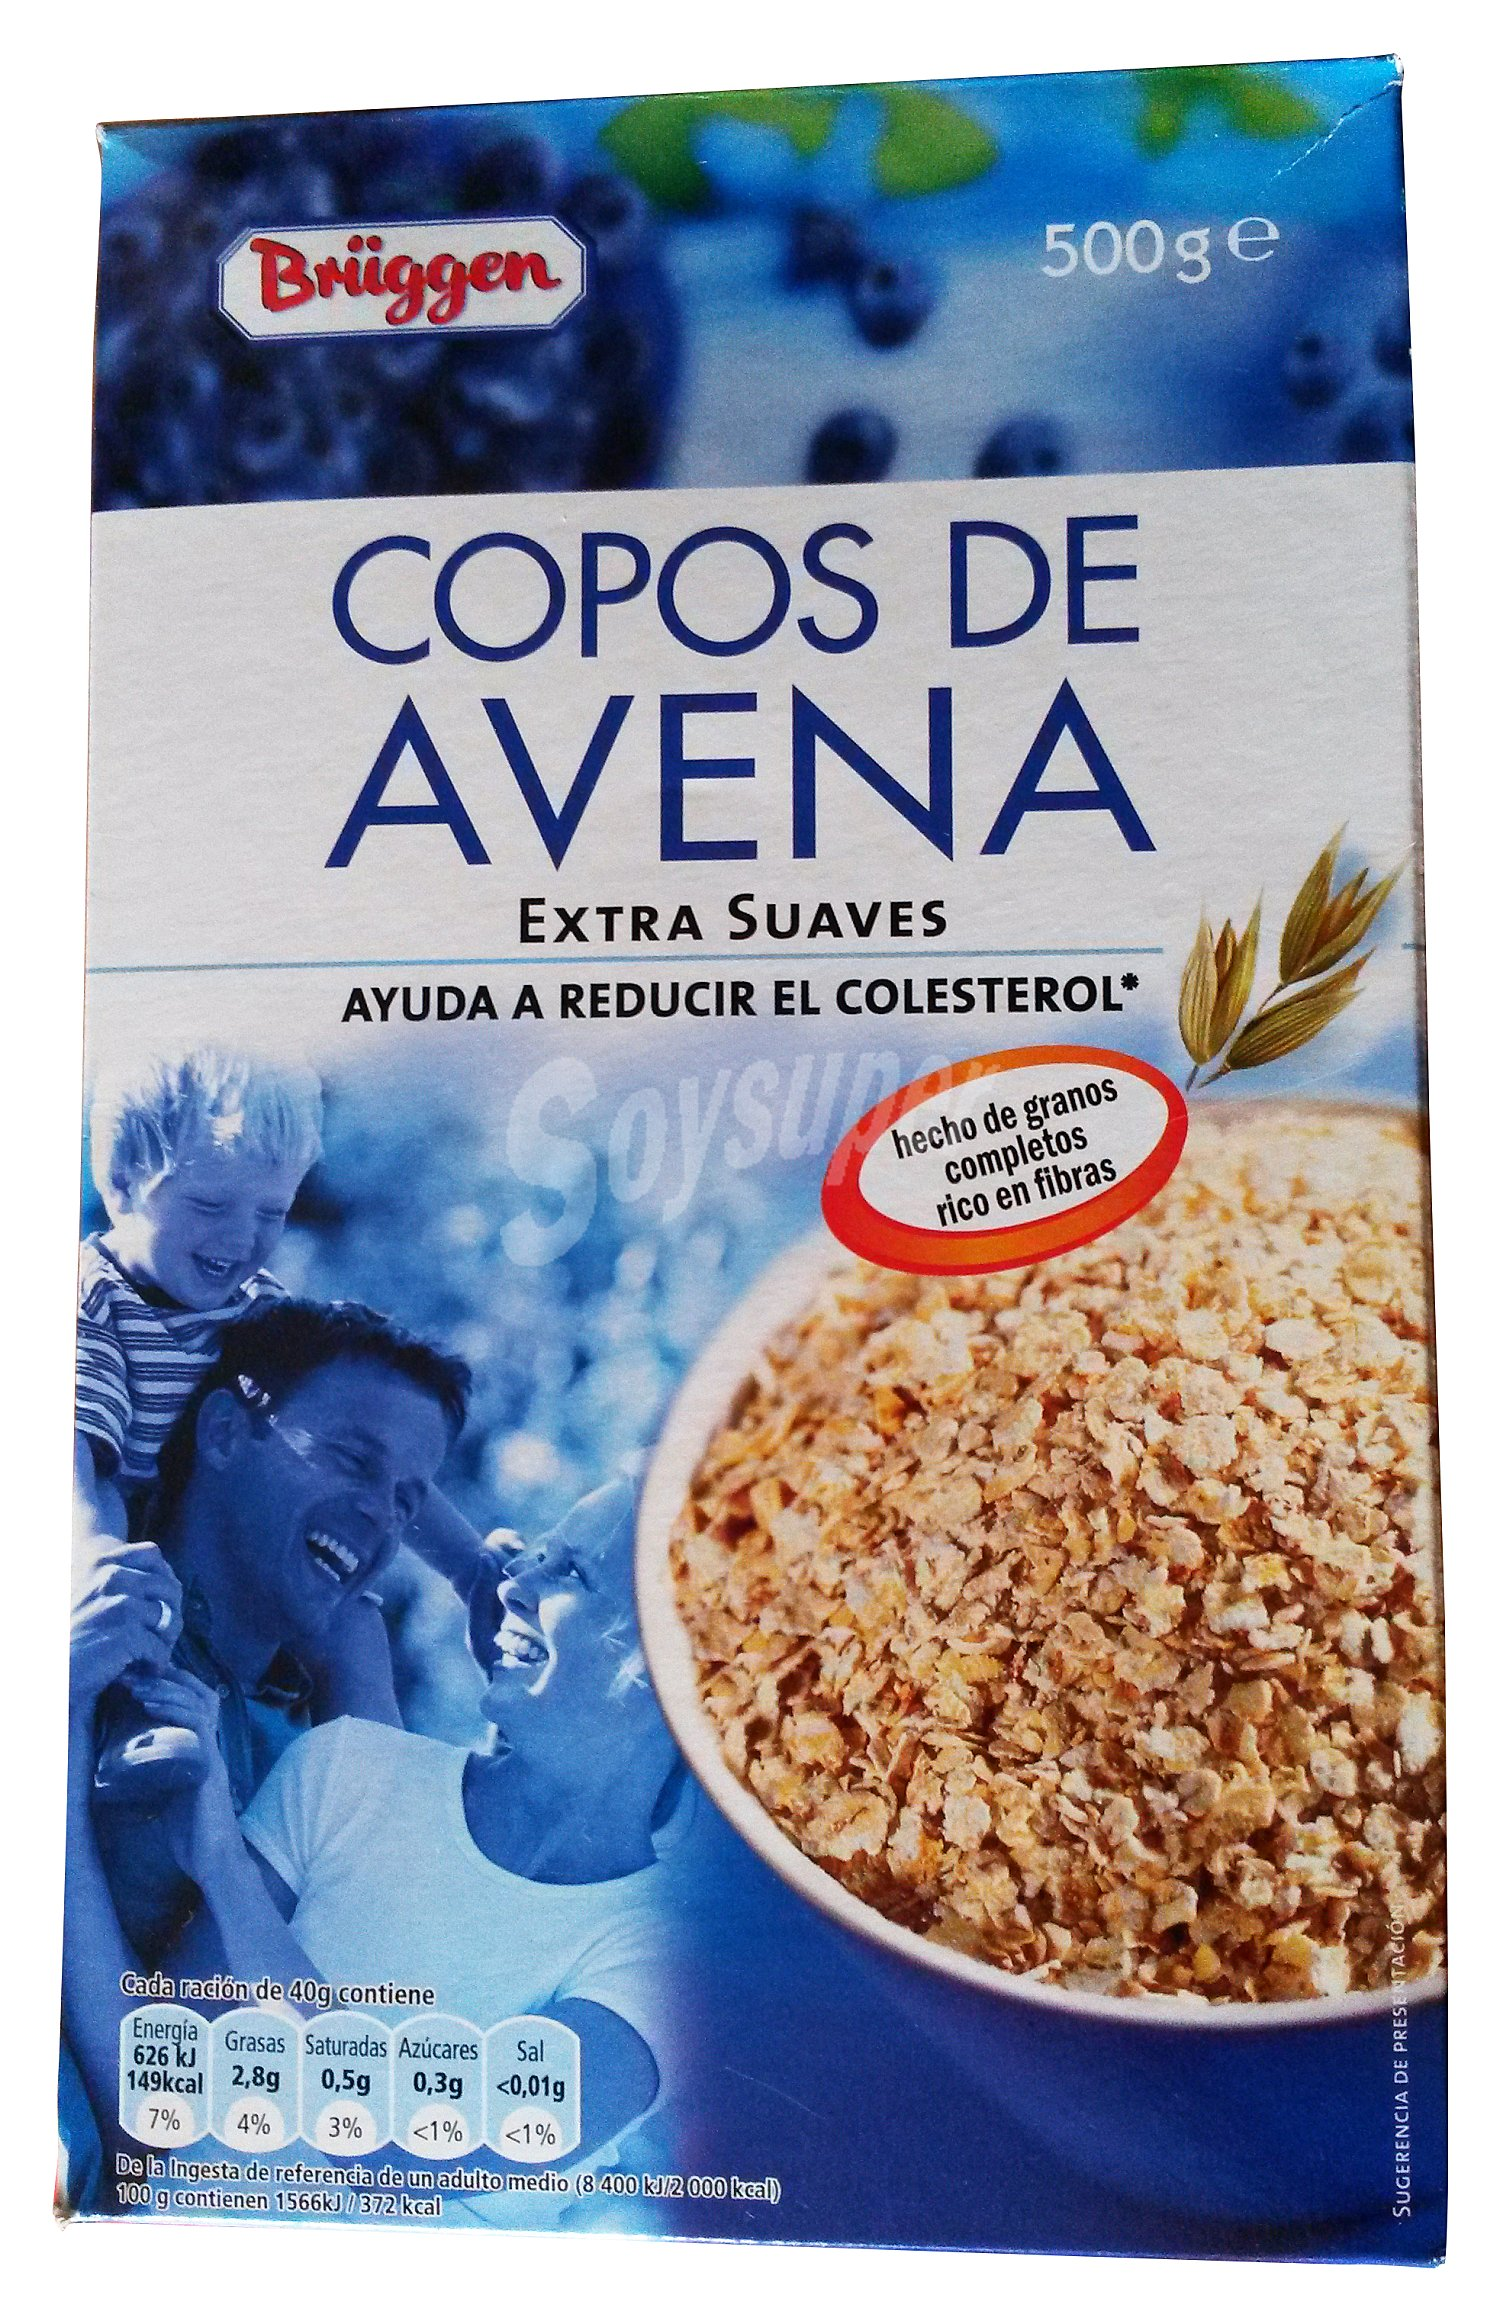 Br ggen cereal copos avena caja 500 g - Copos de avena bruggen ...